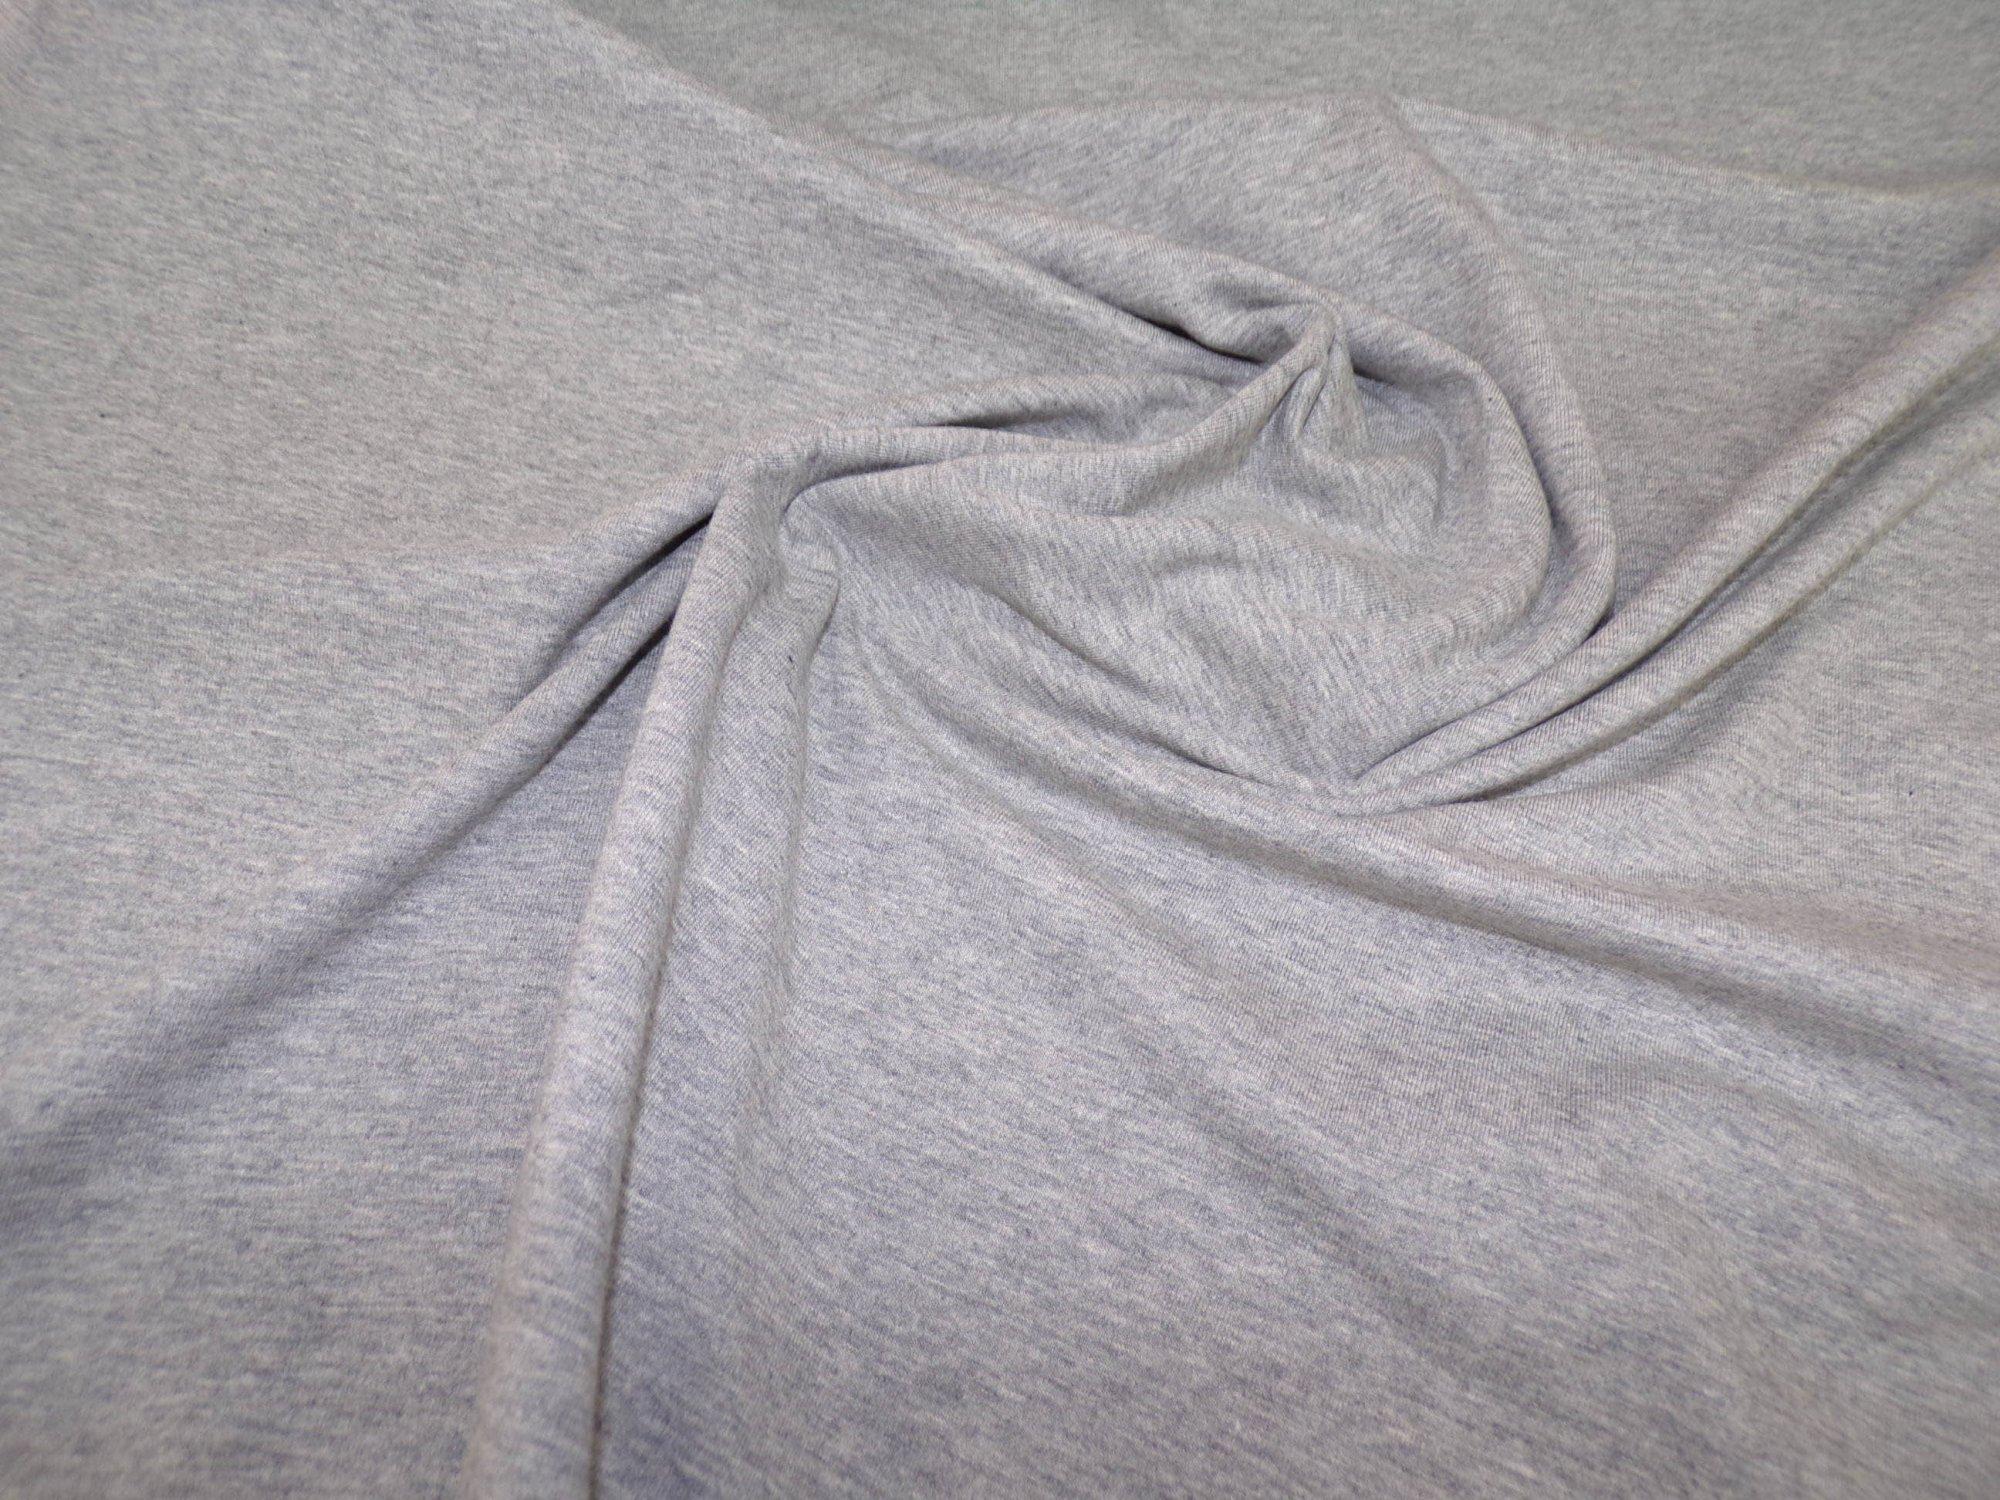 Cotton Lycra Jersey - Light Gray Heathered